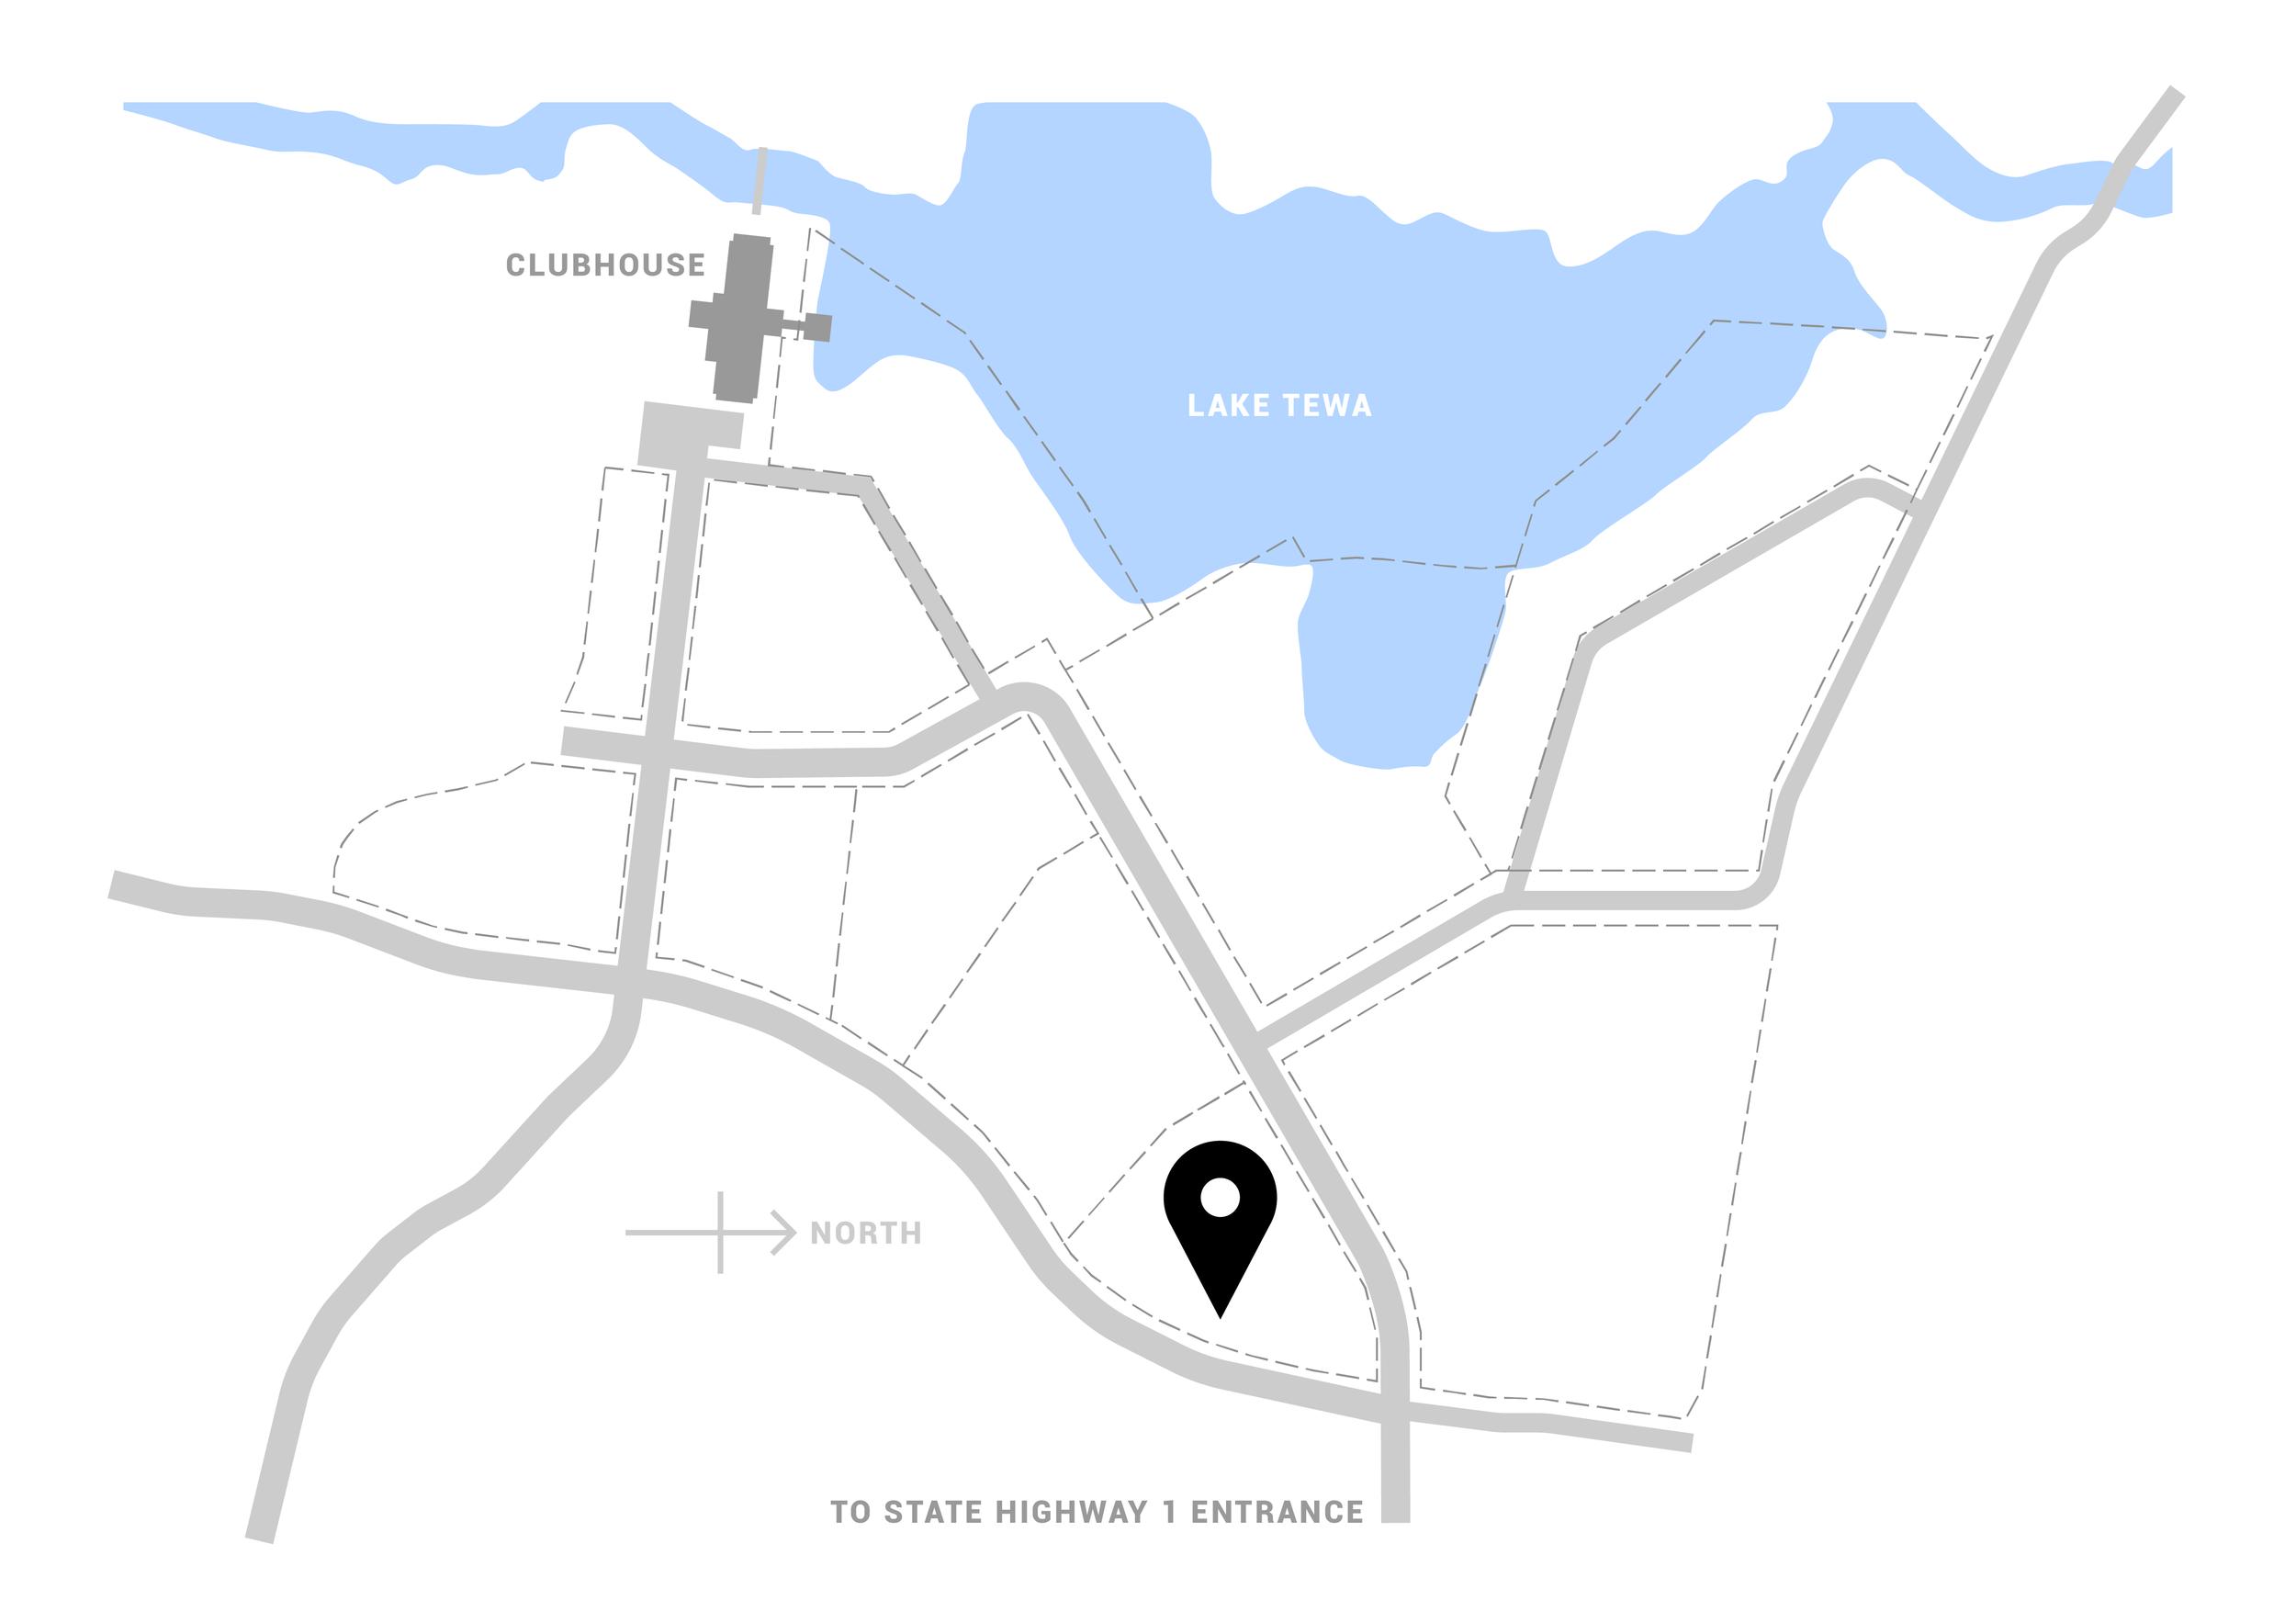 LOT-10-VILLAGE-MAP.png